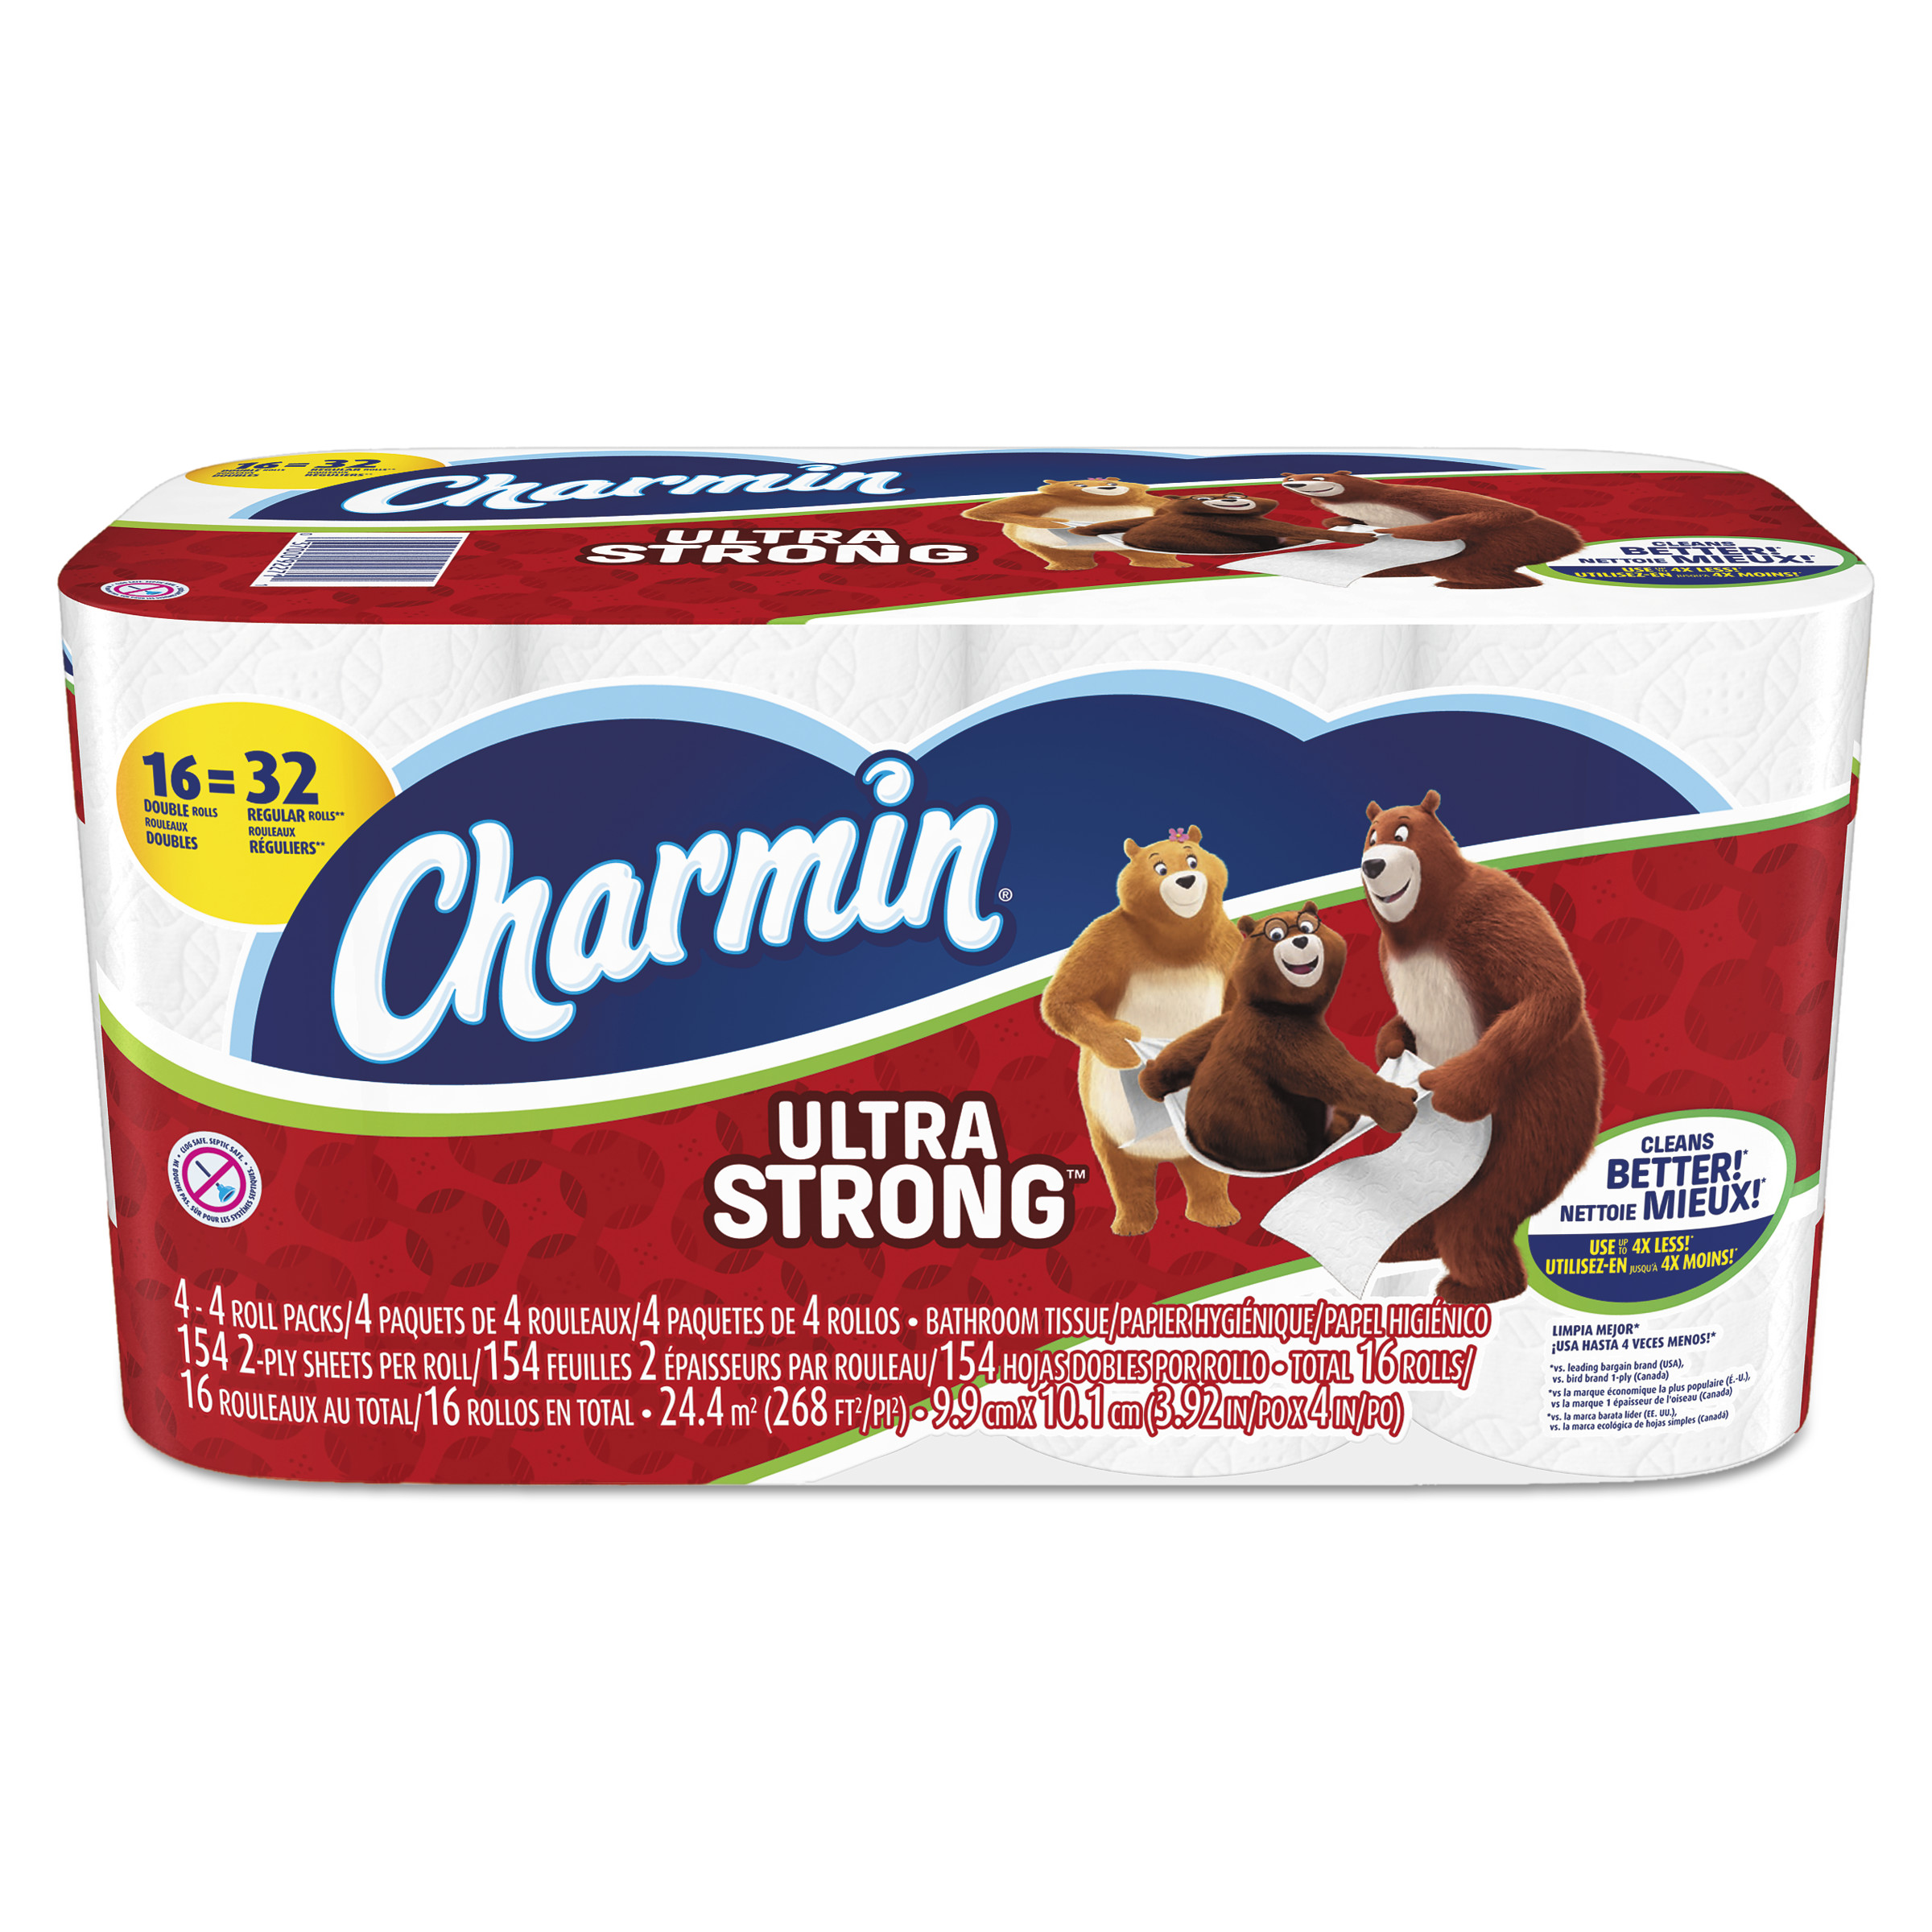 Charmin Toilet Paper, Ultra Strong, 16 Double Rolls - Walmart.com